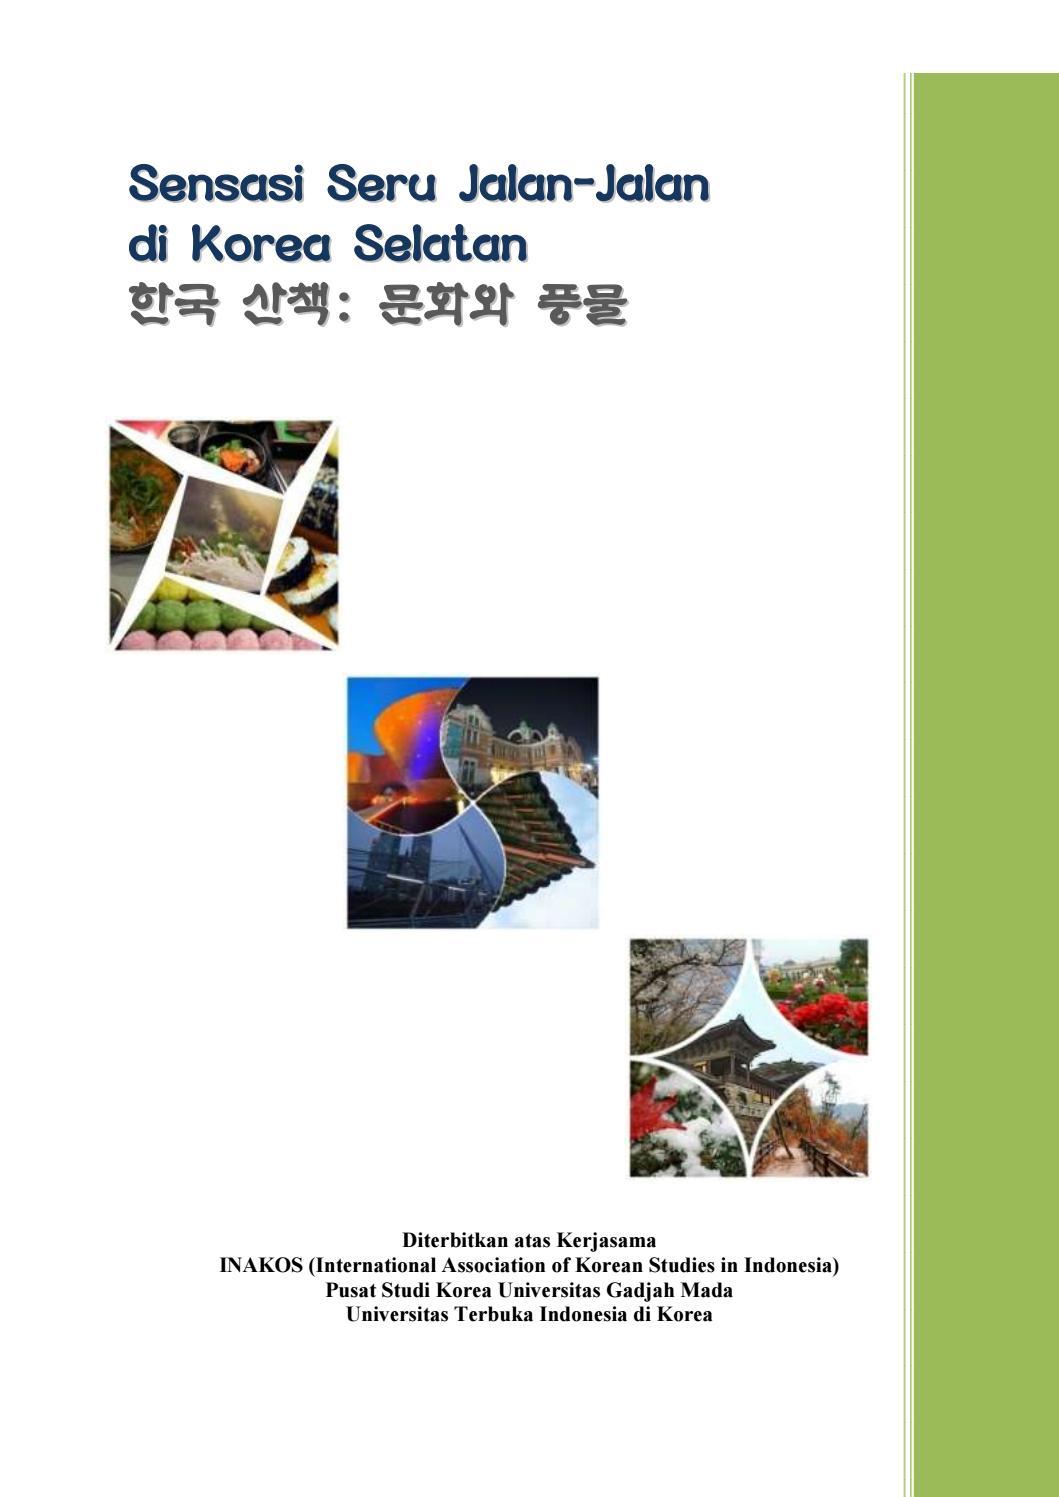 Sensasi Seru Jalan Jalan Di Korea Selatan By Inakos Issuu